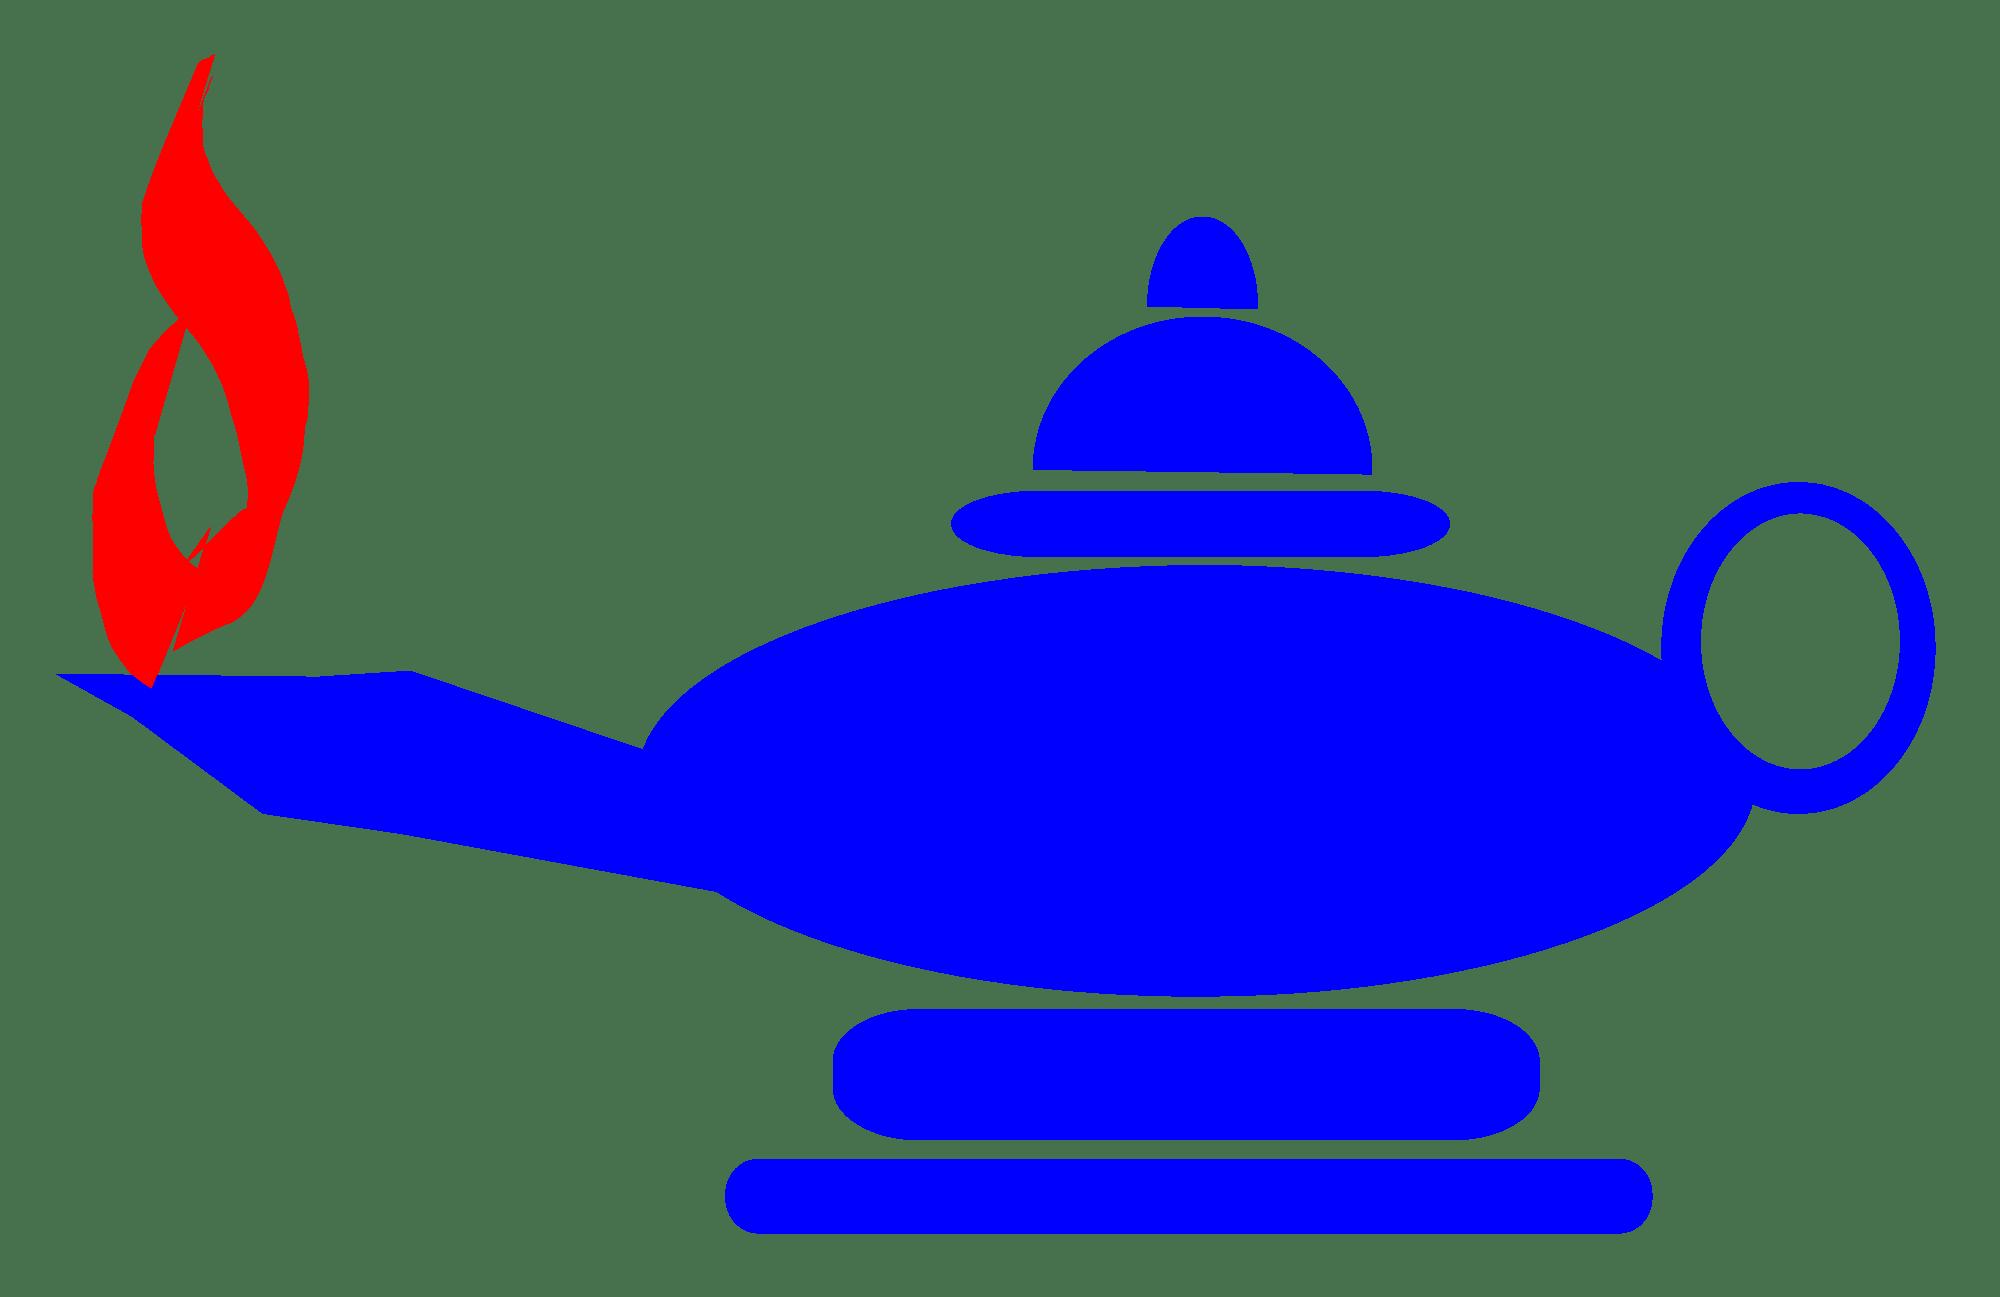 Florence nightingale symbol car. Nurse clipart lamp